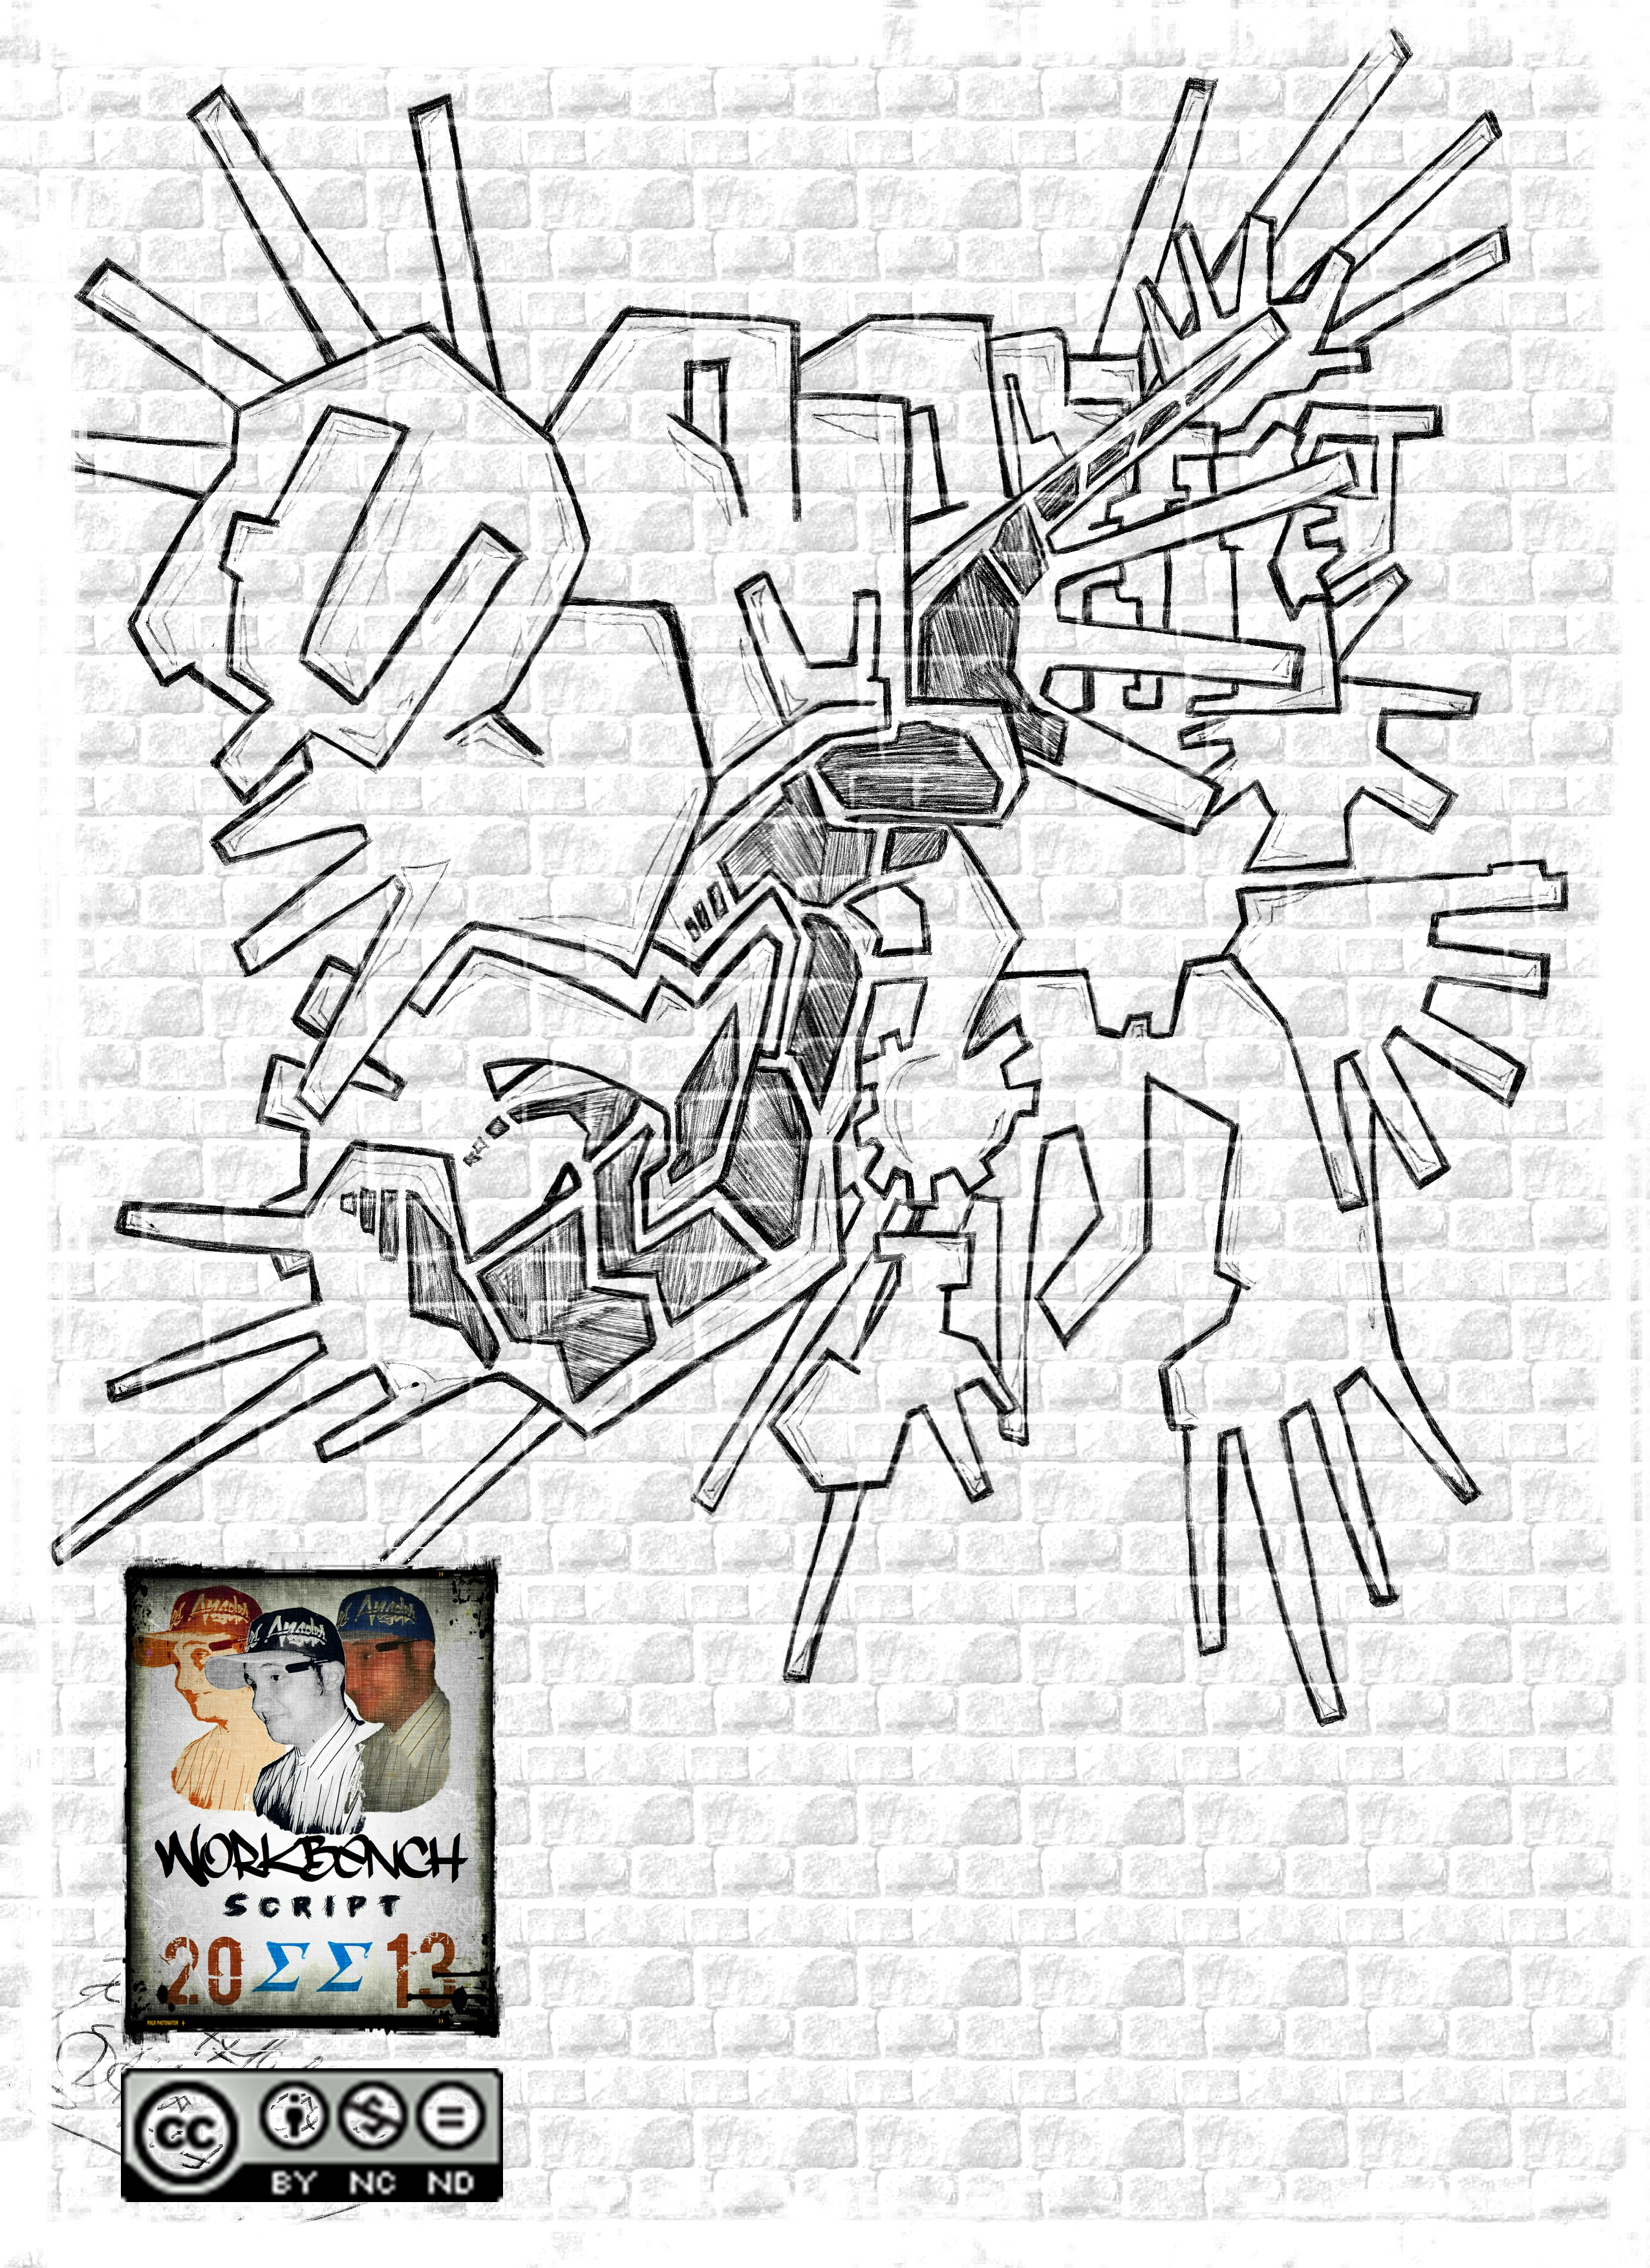 Real Graffiti Shit Vol.2 by Workbench Script SS